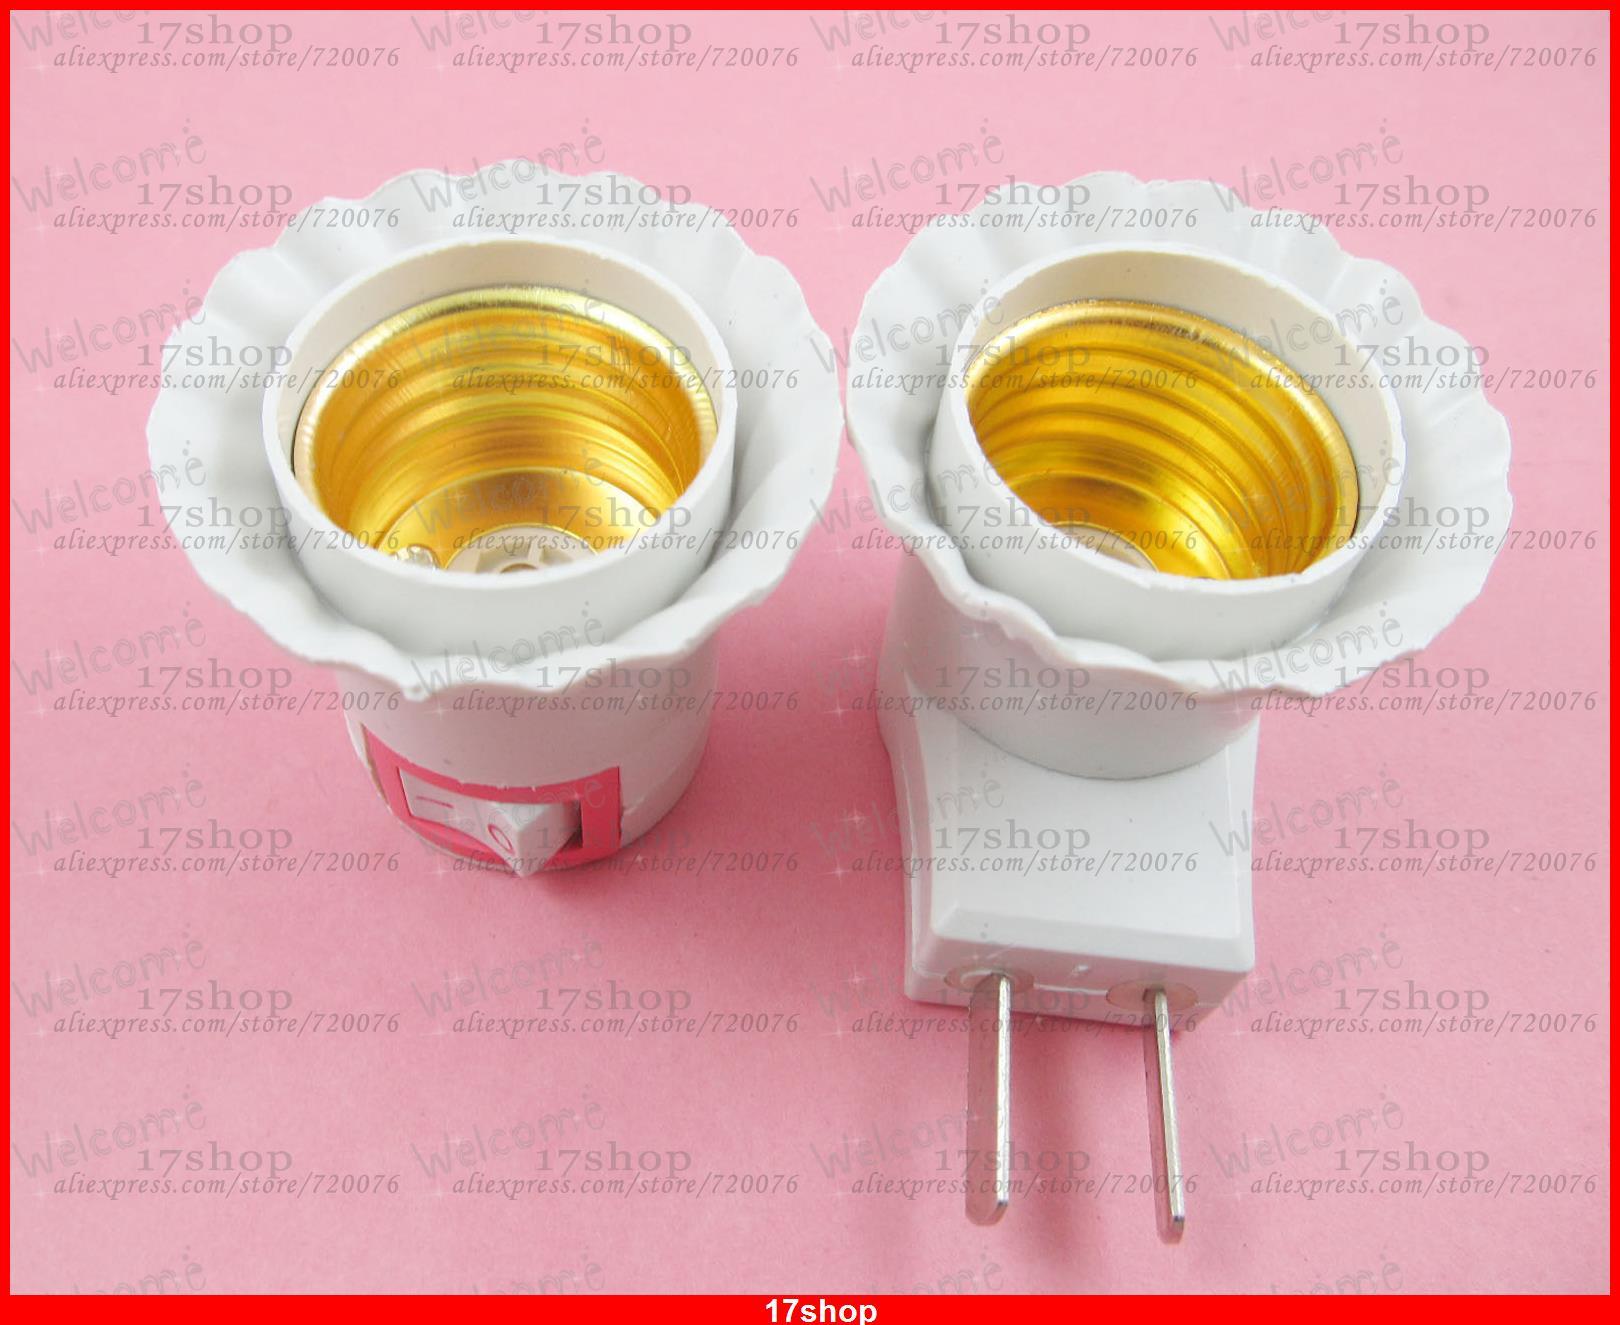 20pcs x LED Light Bulb Lamp Socket Base Holder E27 to US AU Plug Adapter Converter